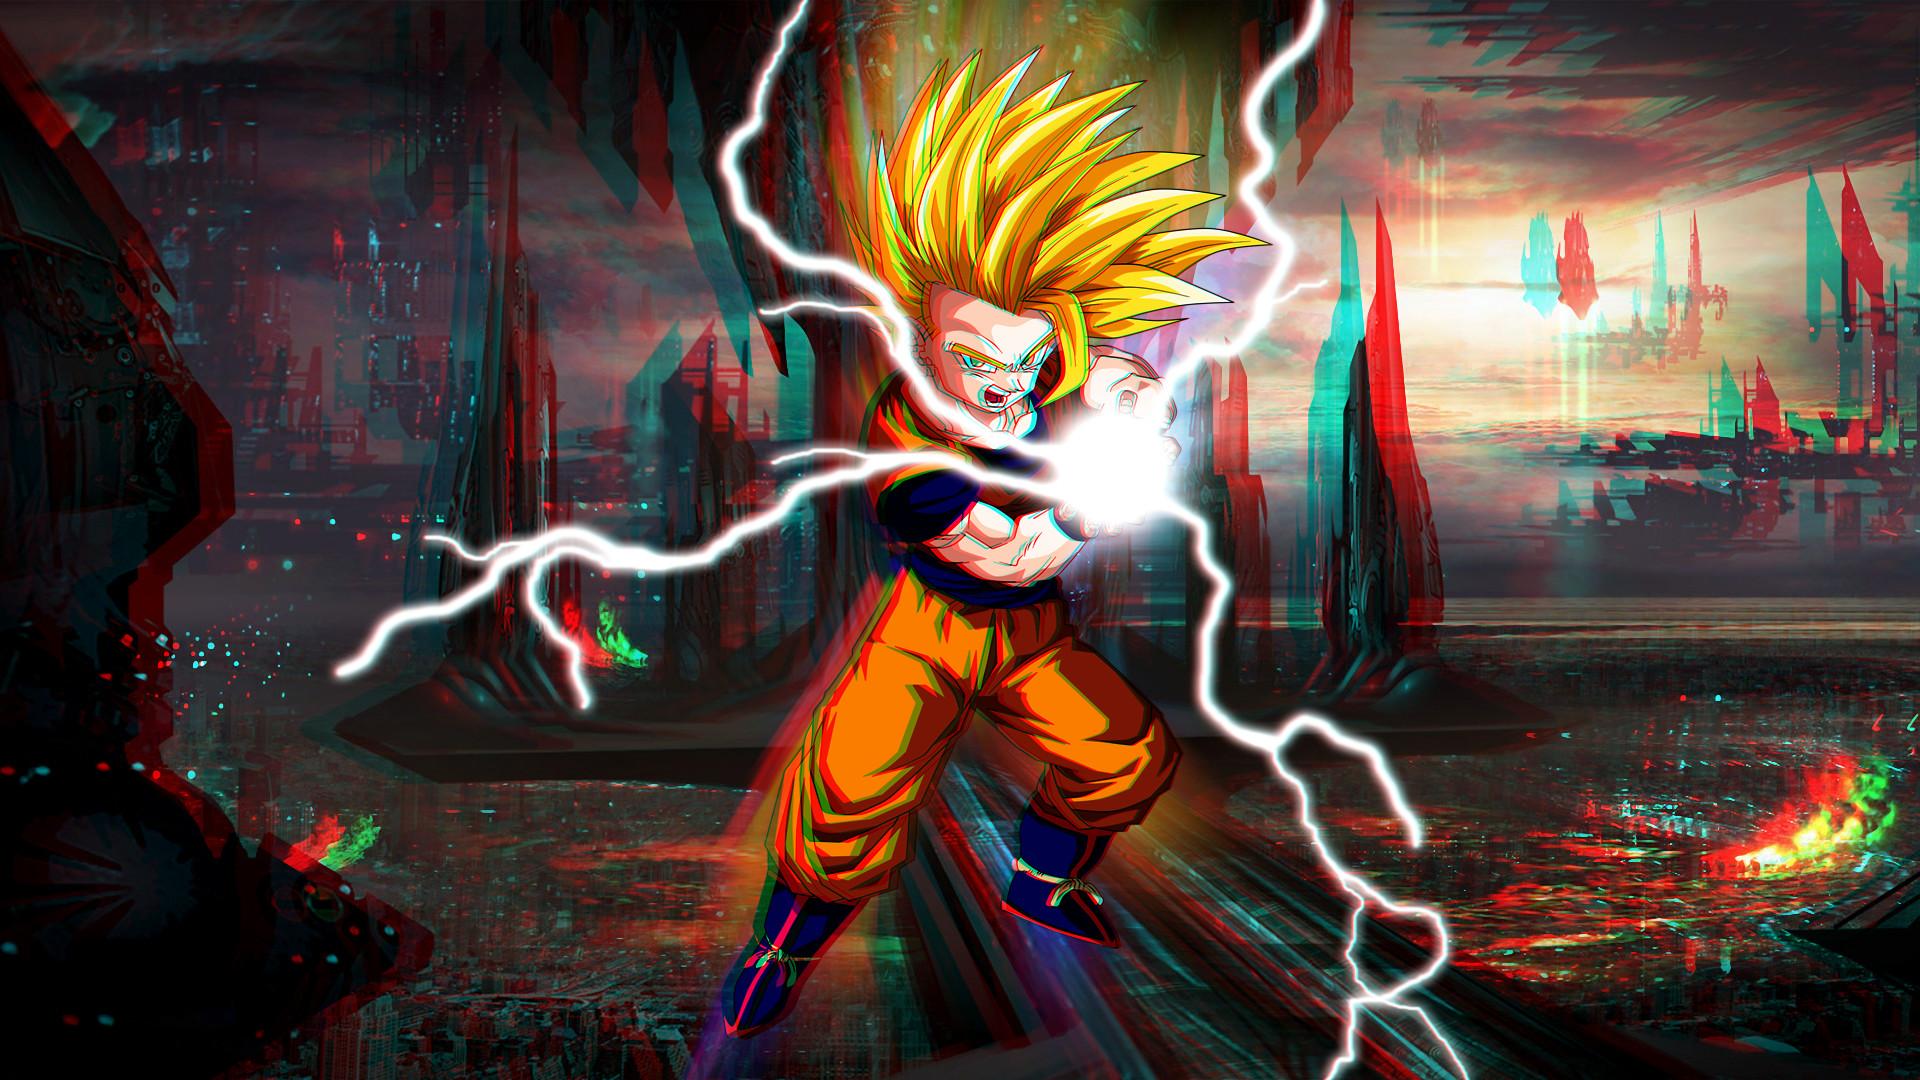 Super Saiyan 4 Goku And Vegeta Wallpapers (60+ Images